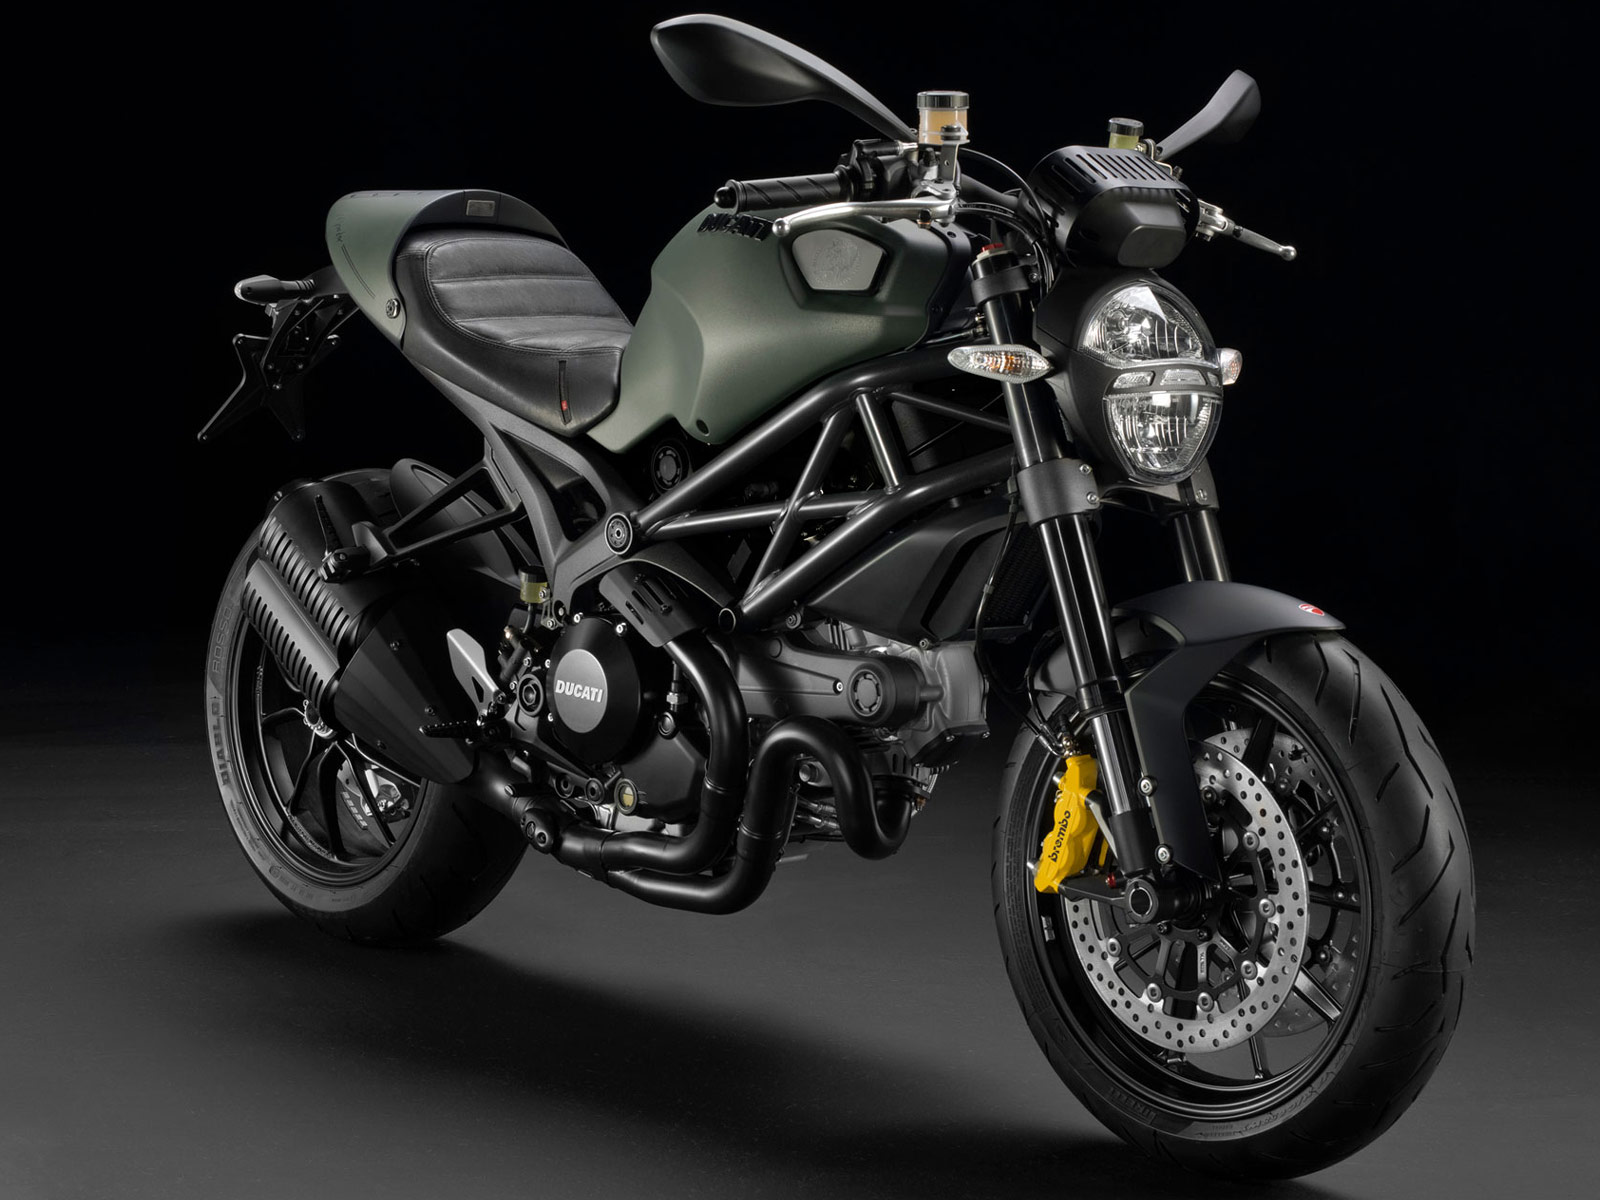 2013 Ducati Monster 1100 EVO Diesel motorcycle photos and ...